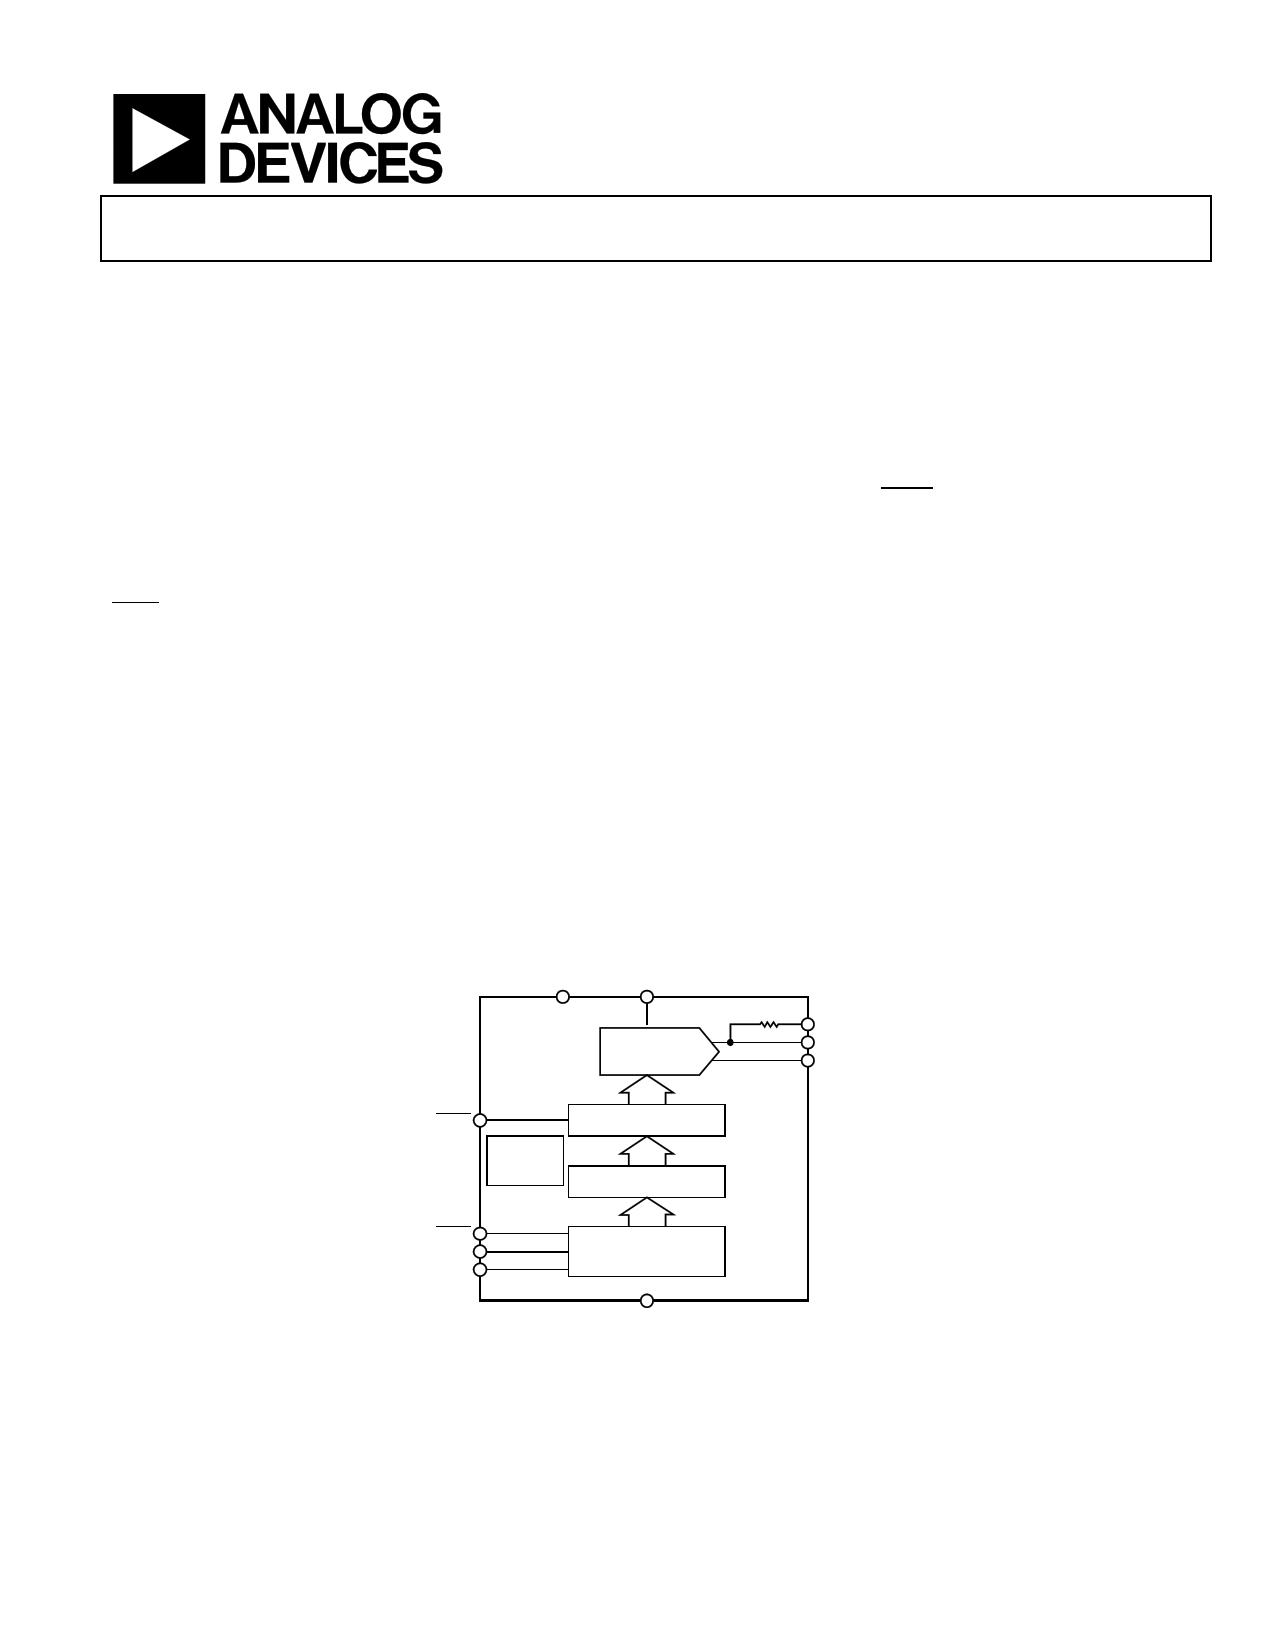 AD5425 datasheet